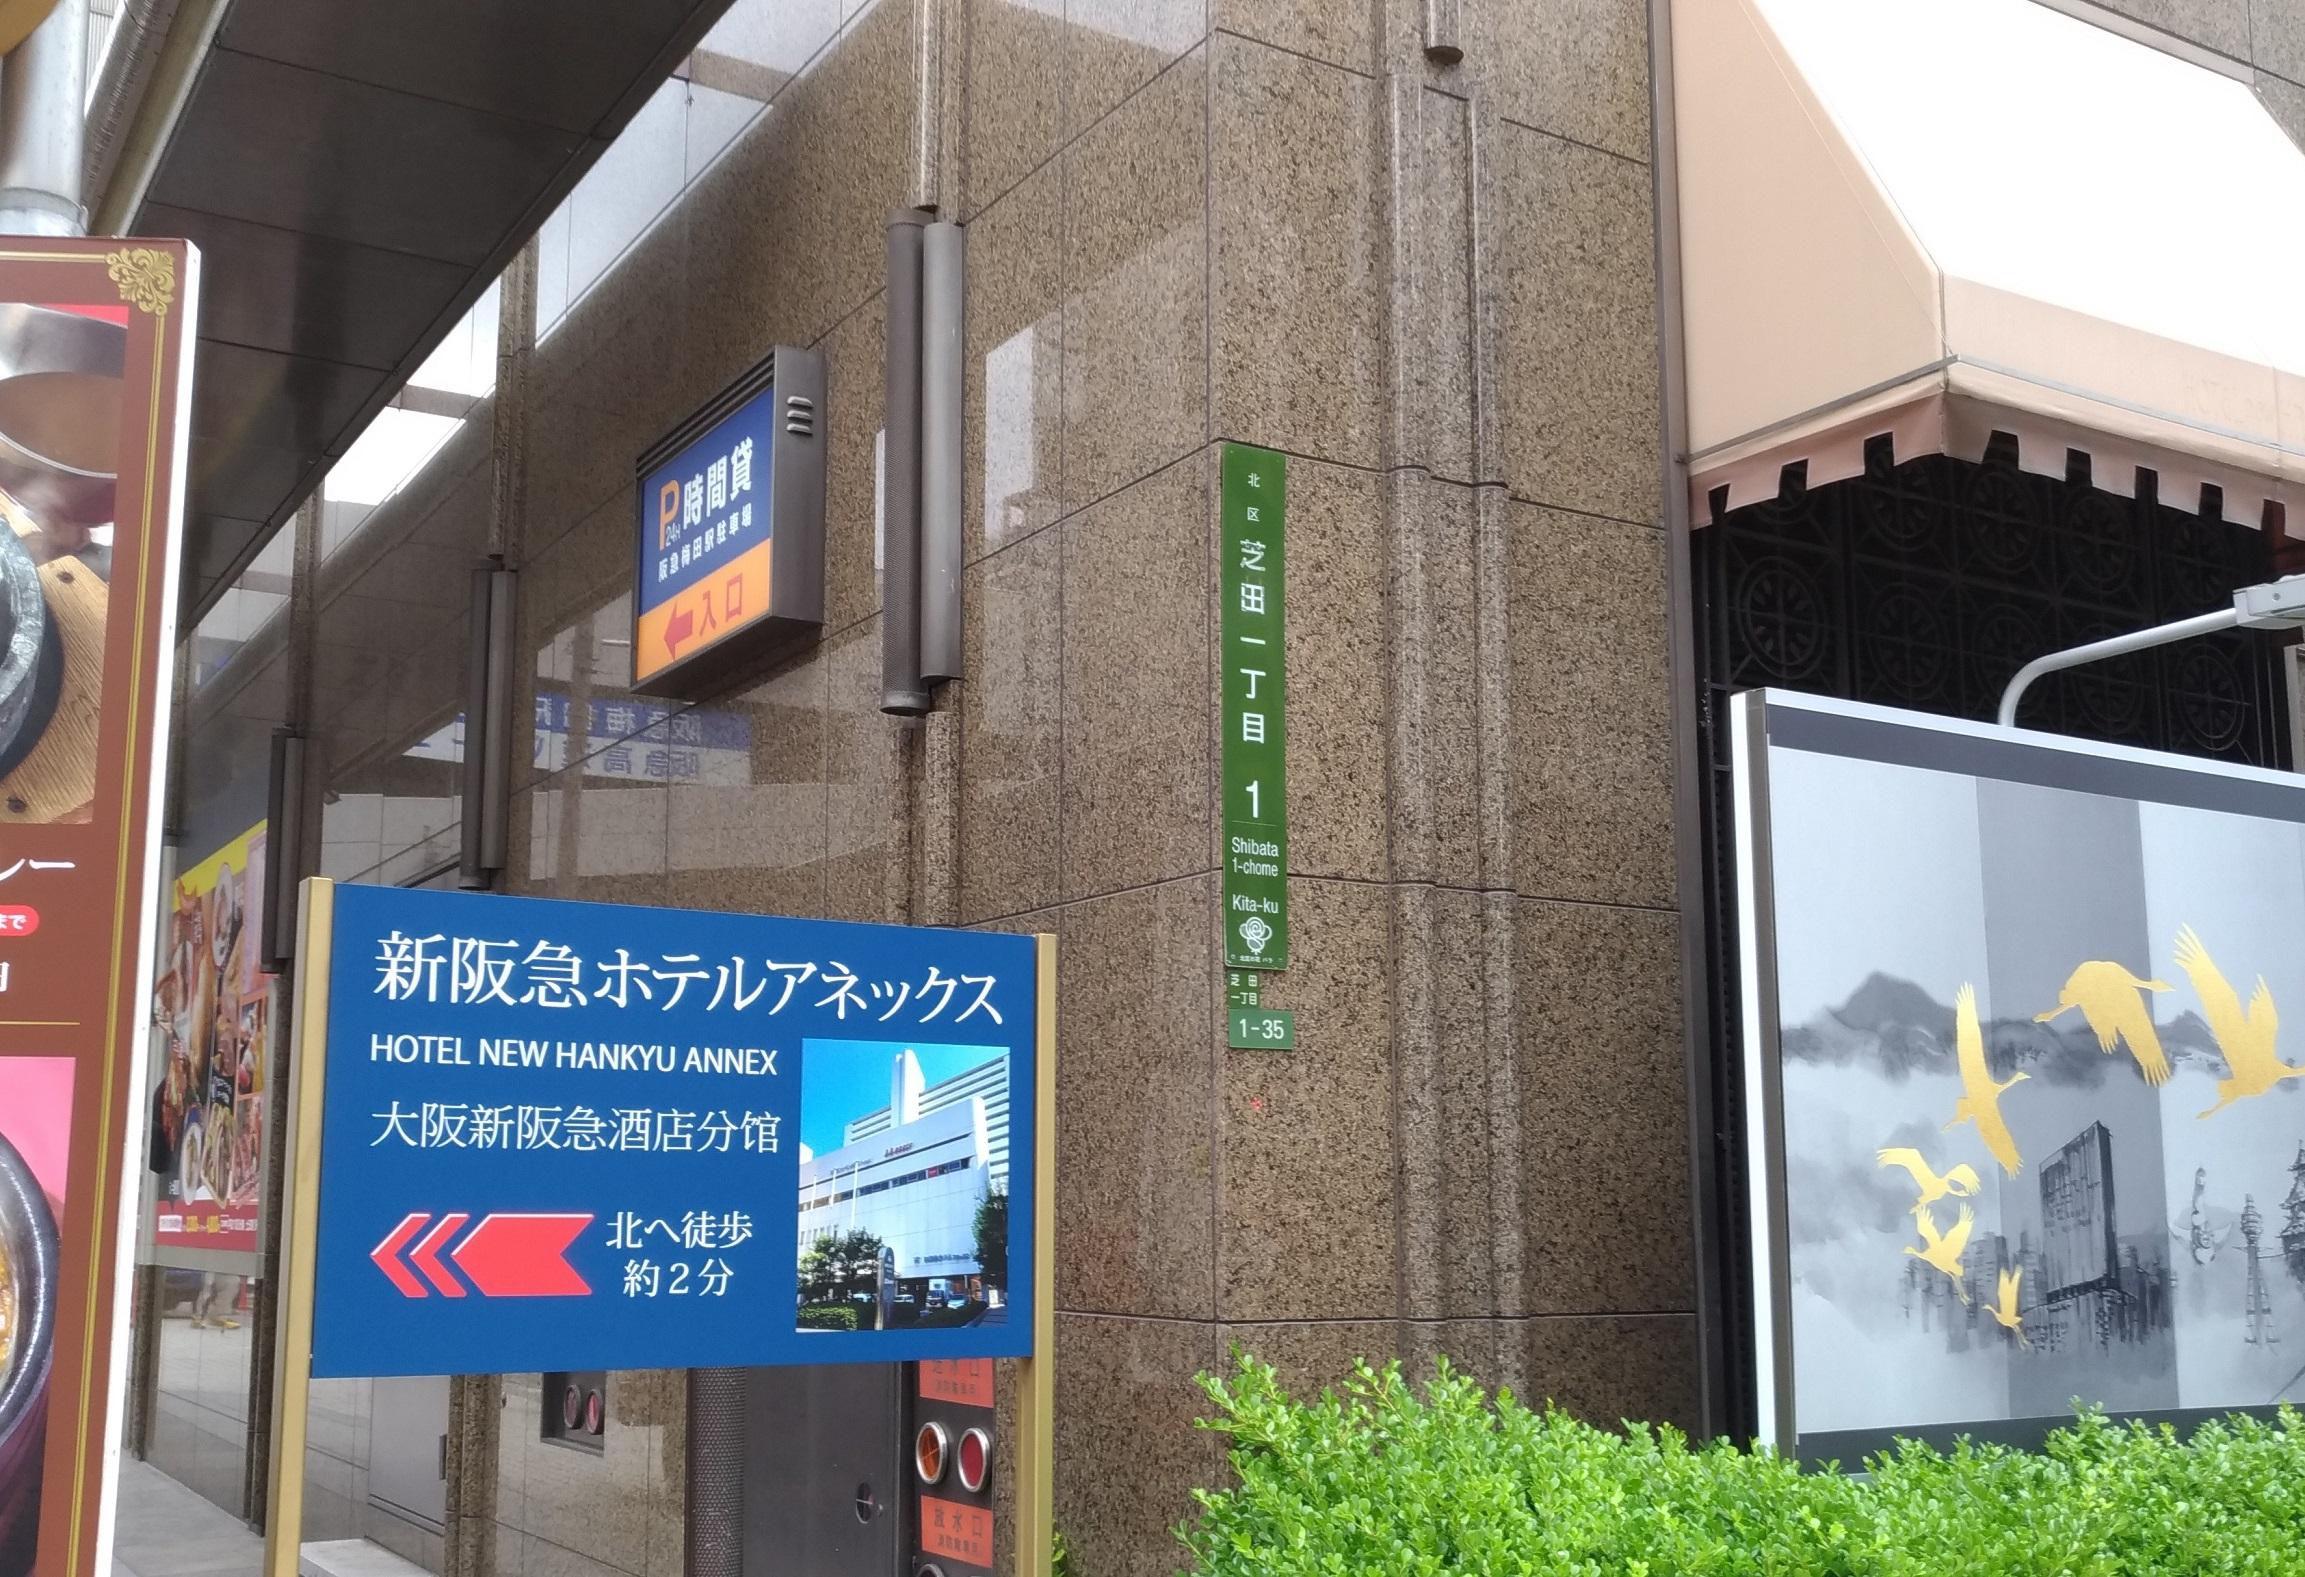 osaka_yodobashi_umeda_0706_2.jpg